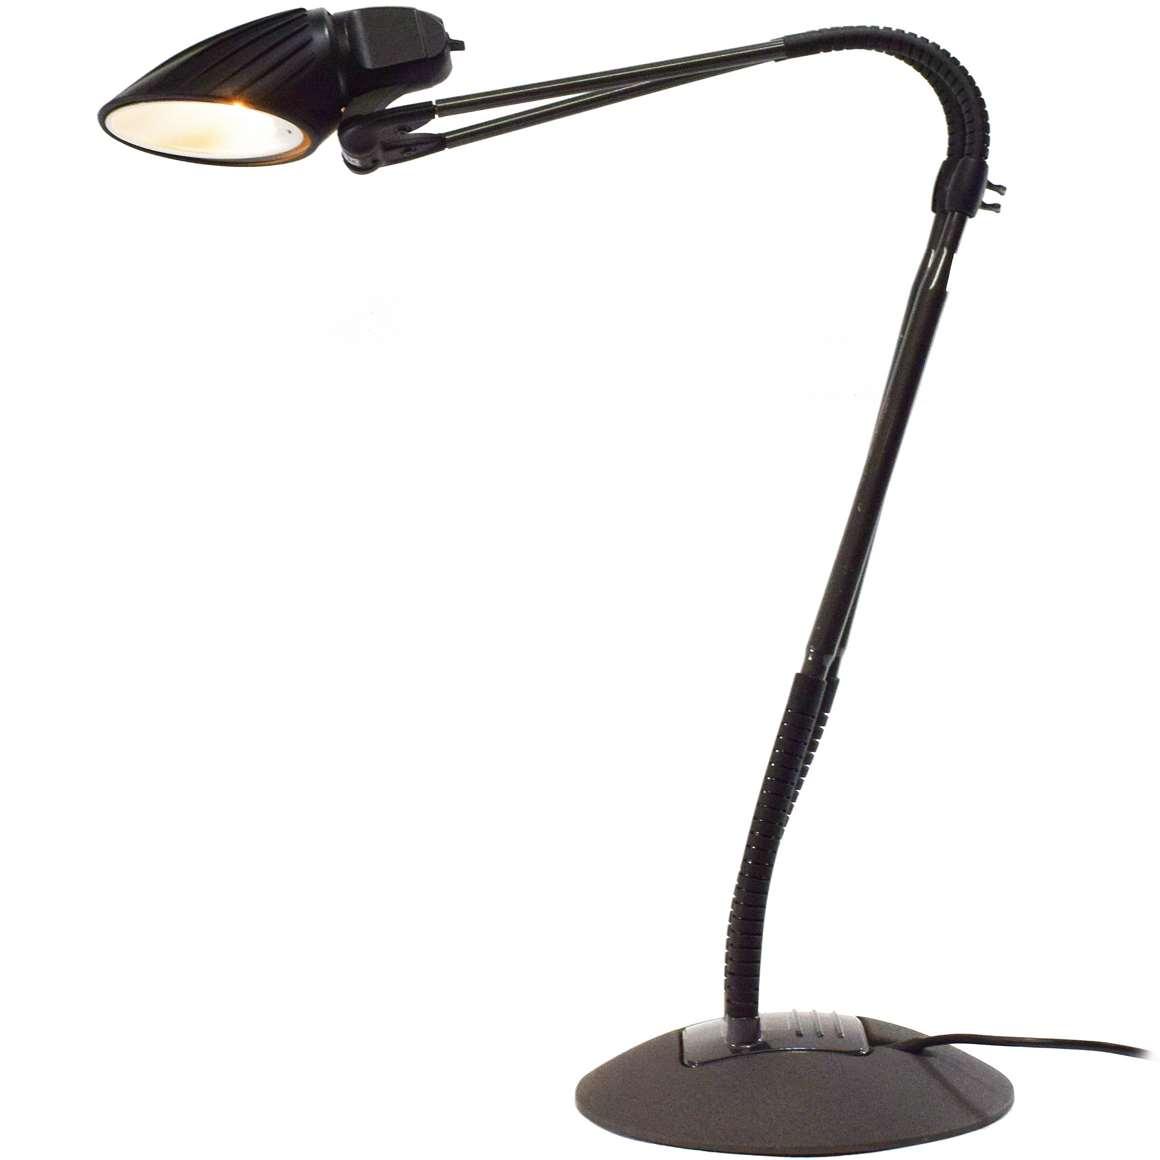 Arteluce Tango Desk Lamp Vintage Info All About